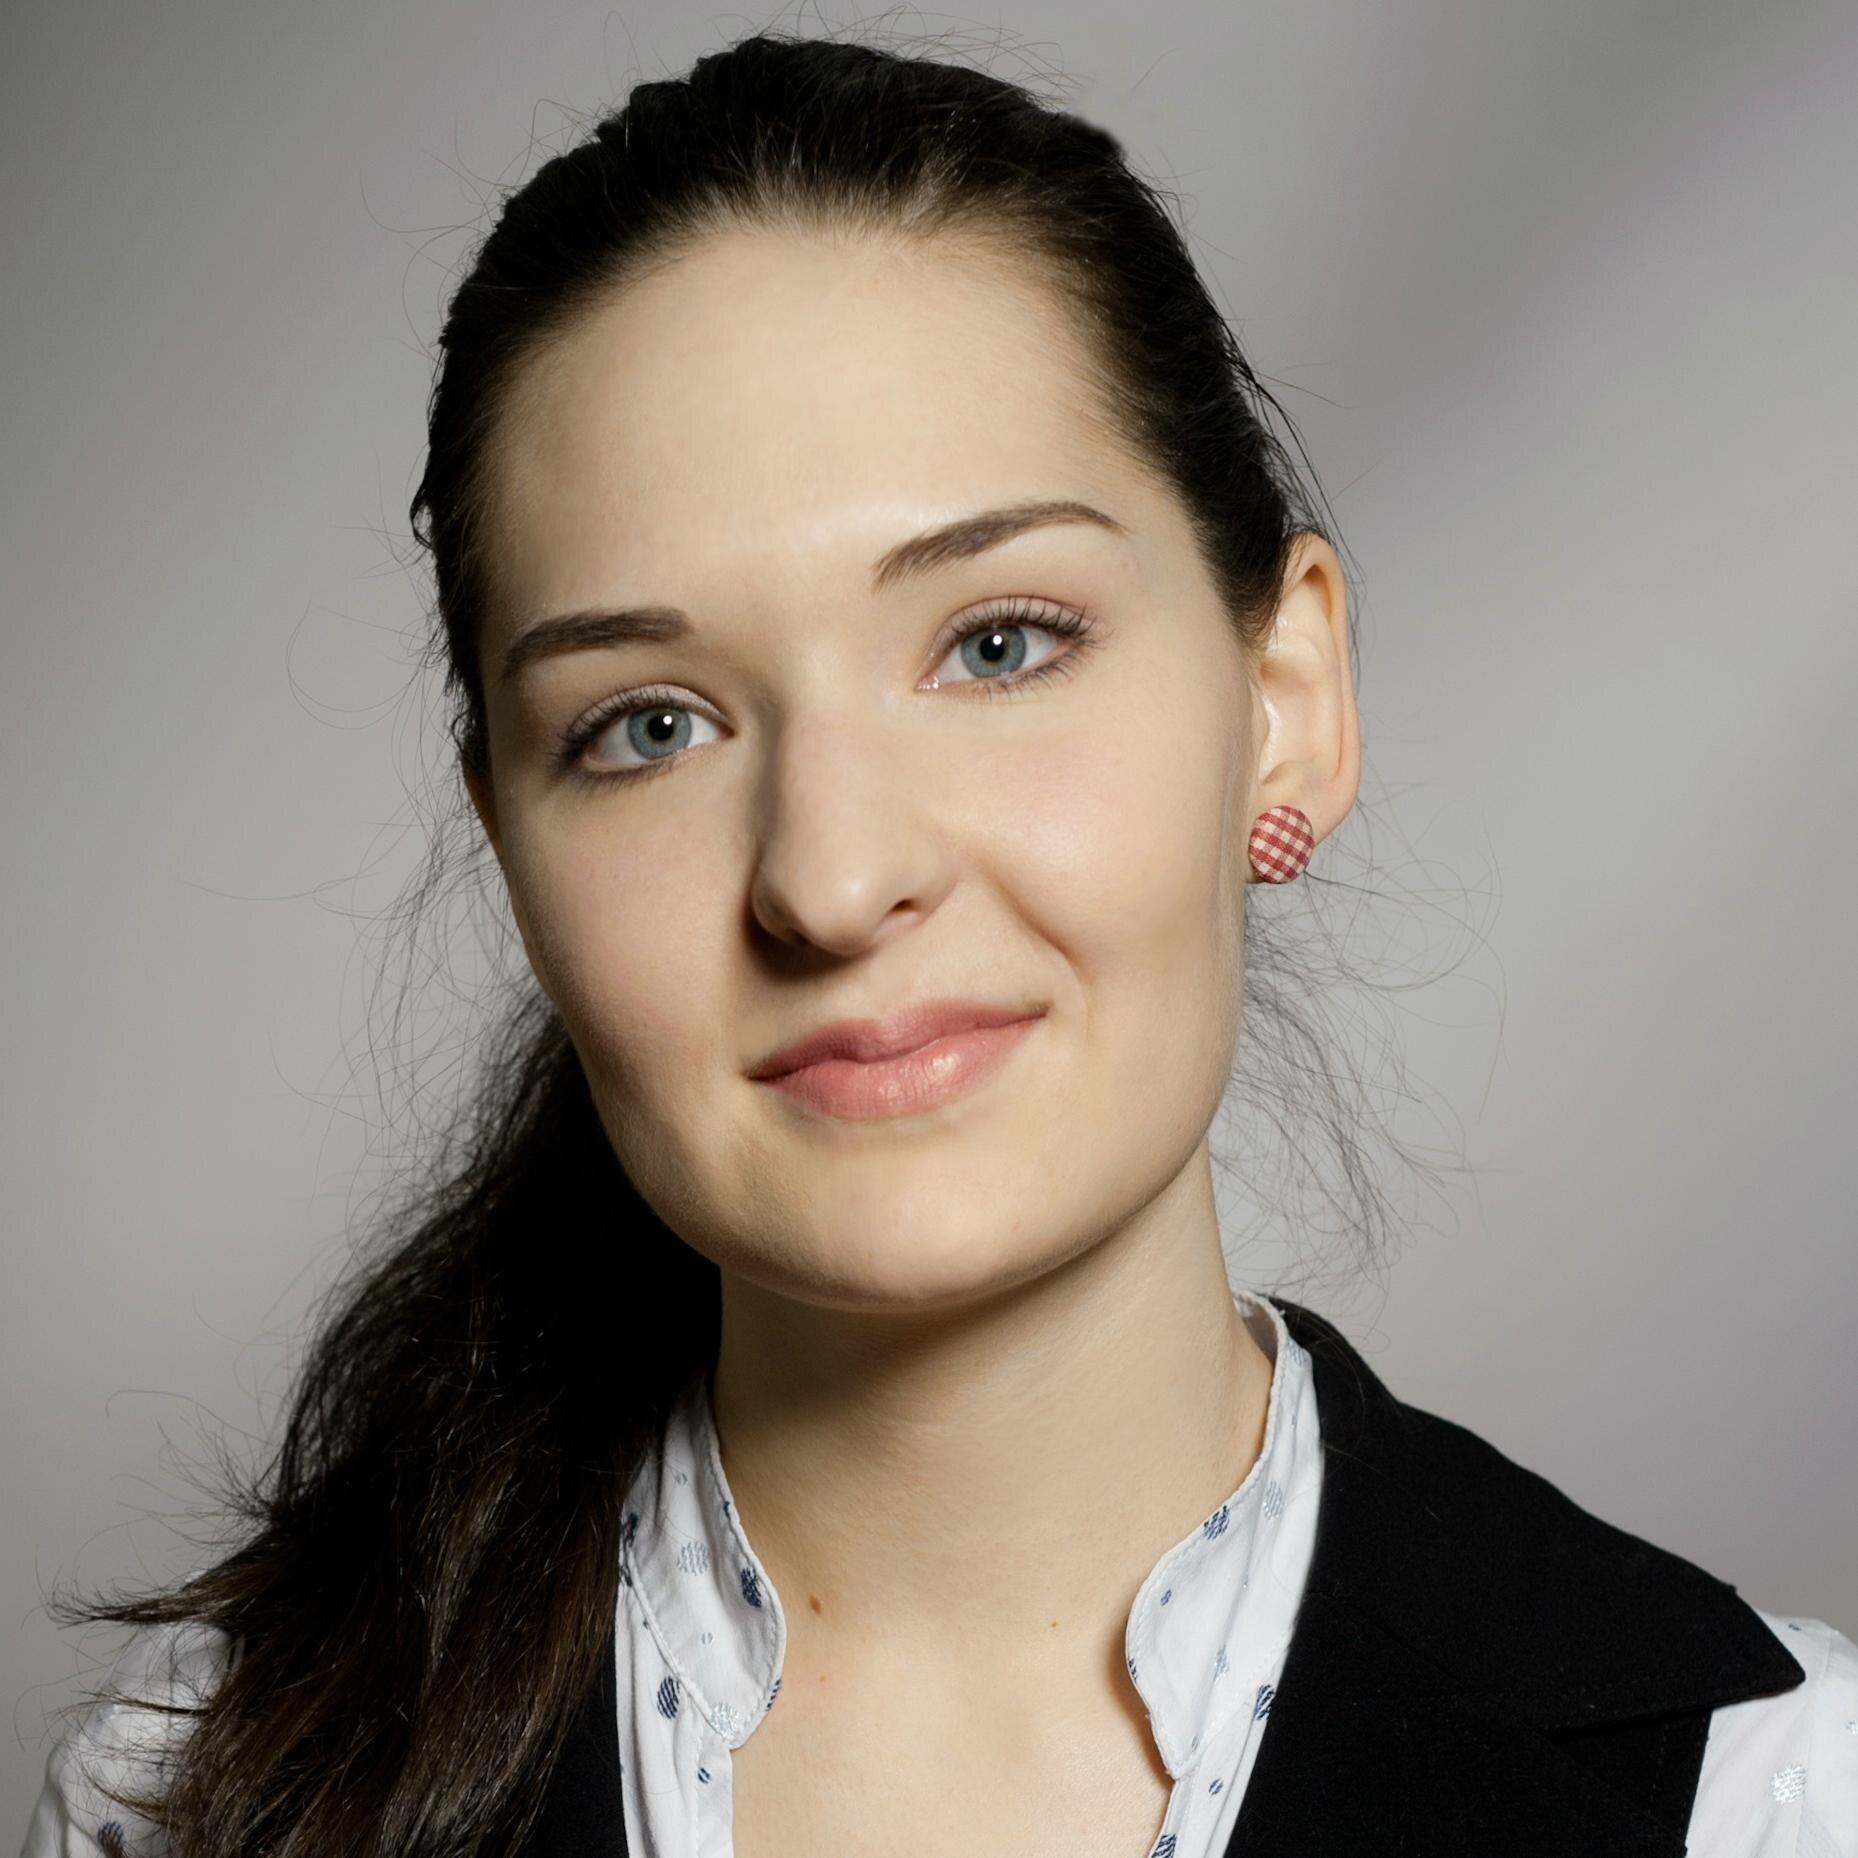 Blanka Mikulaskova